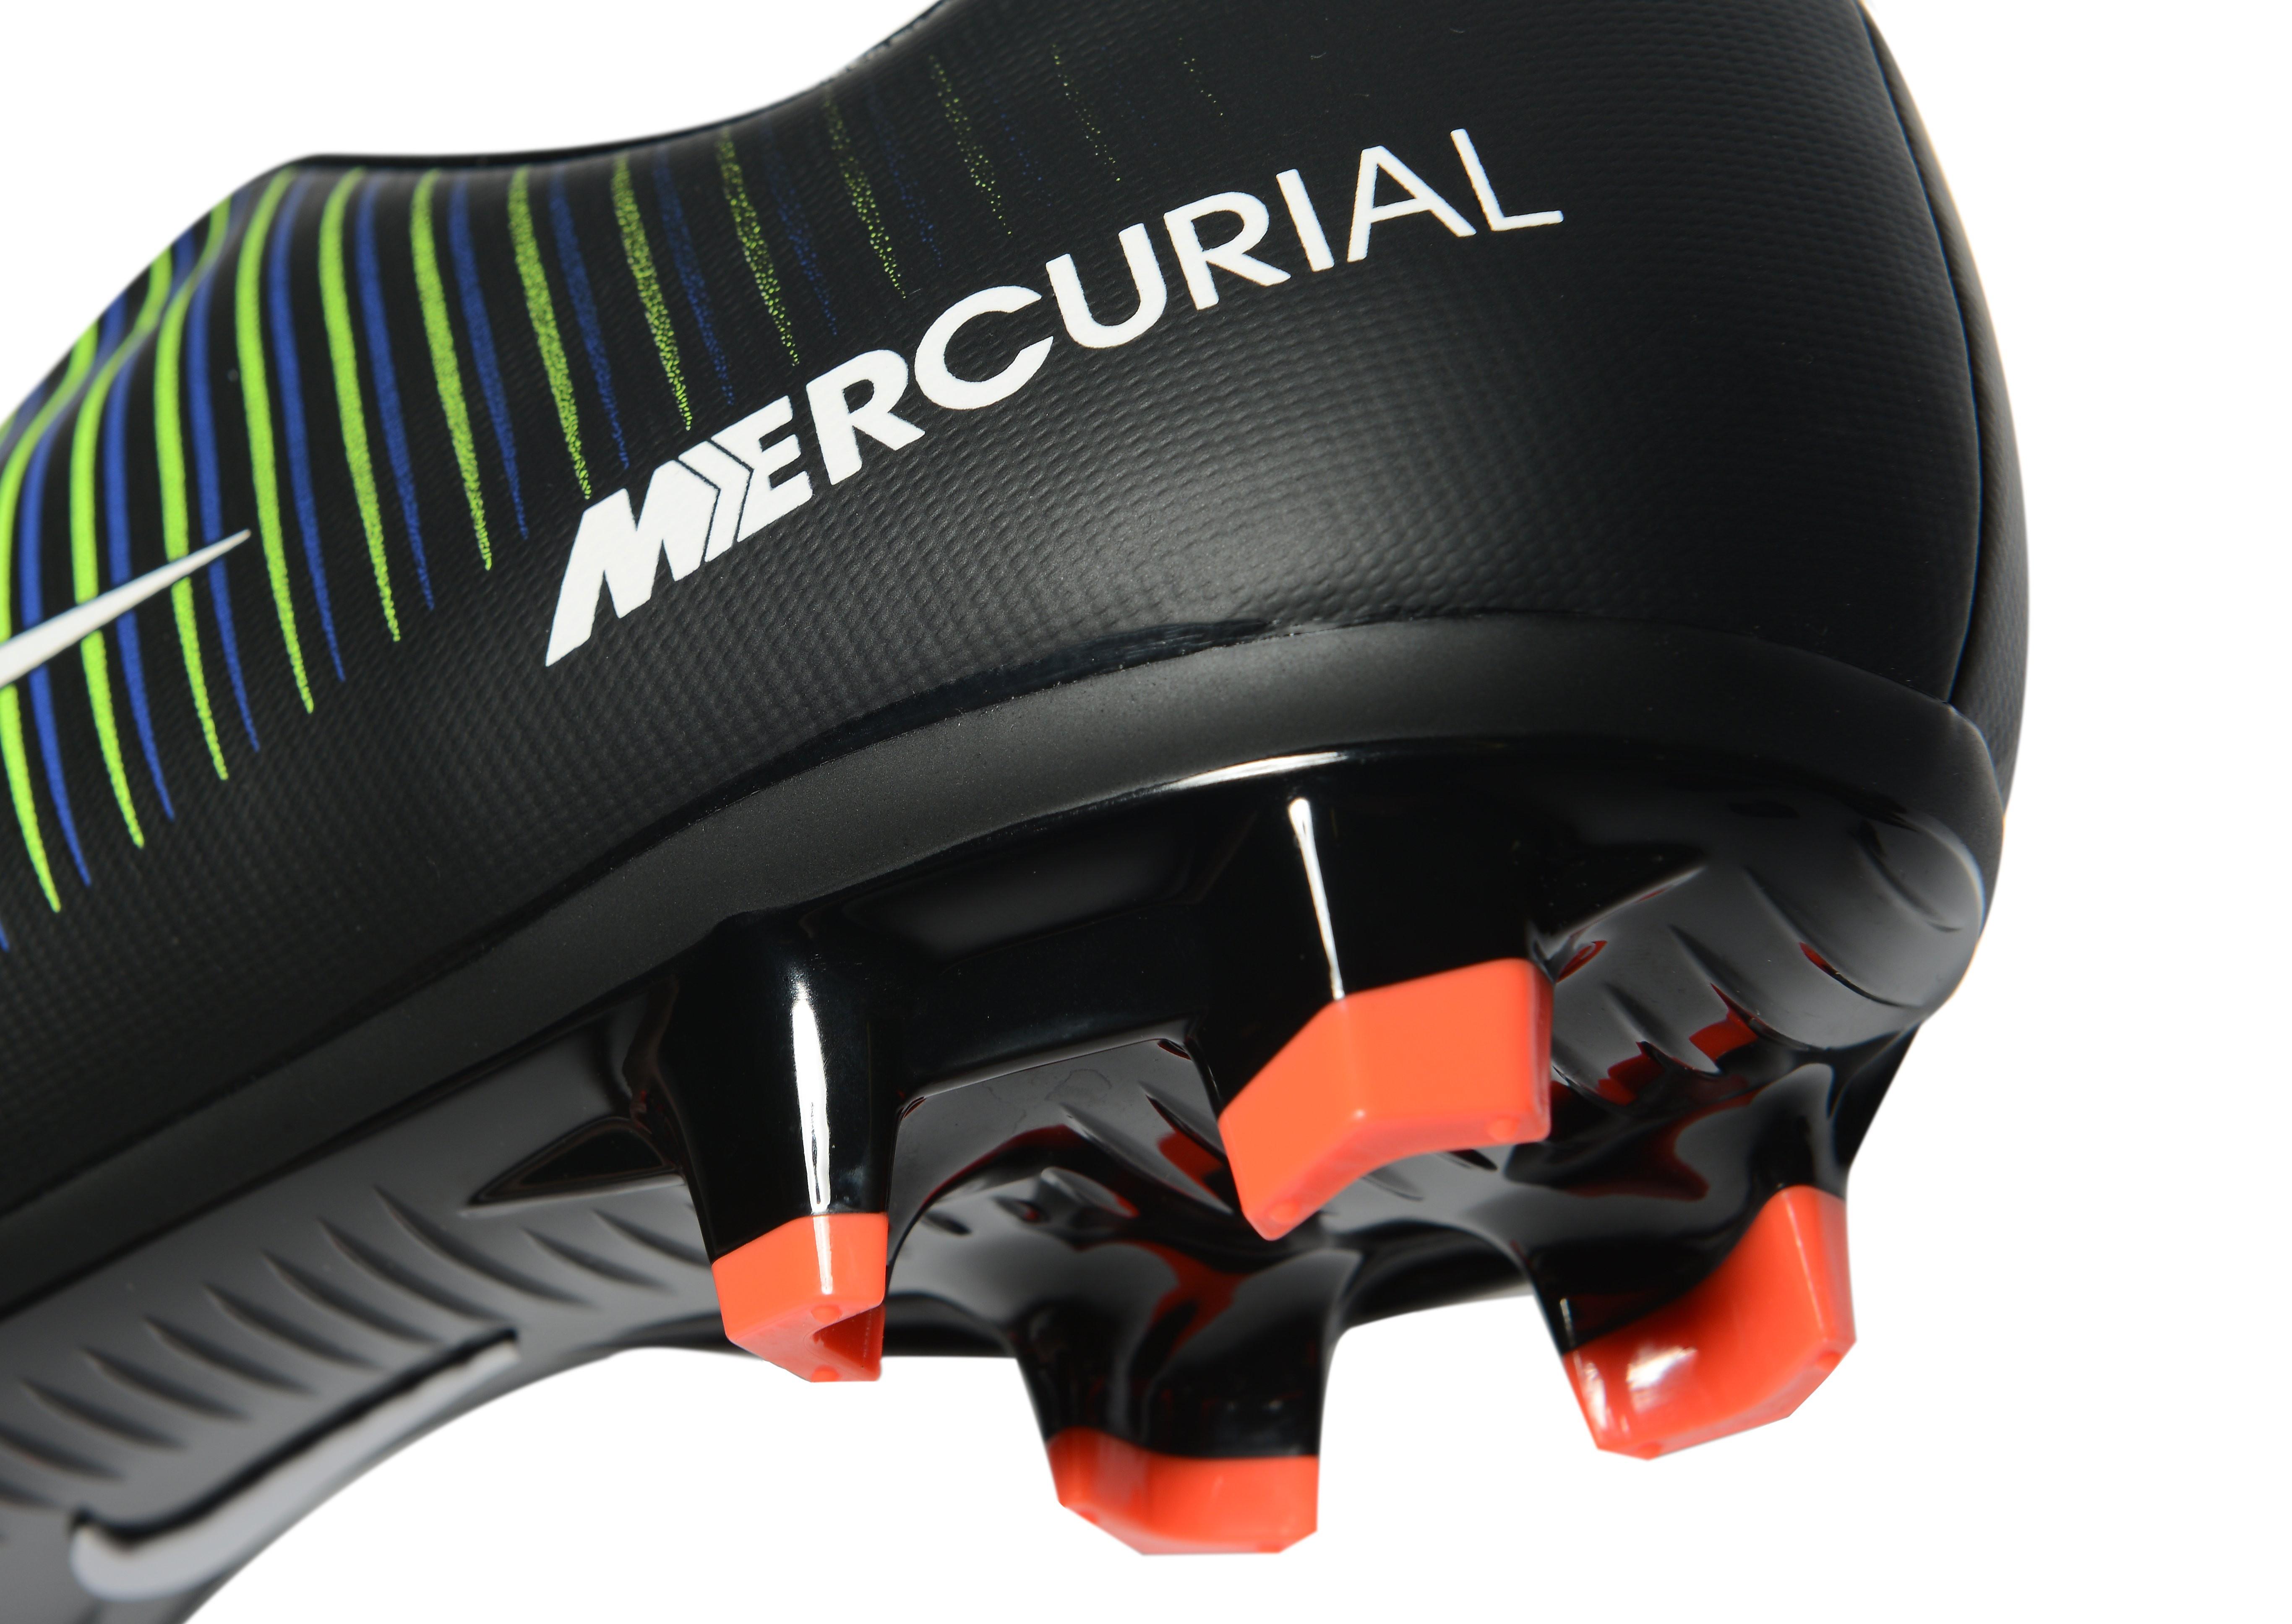 Nike Dark Lightning Mercurial Victory VI Firm Ground